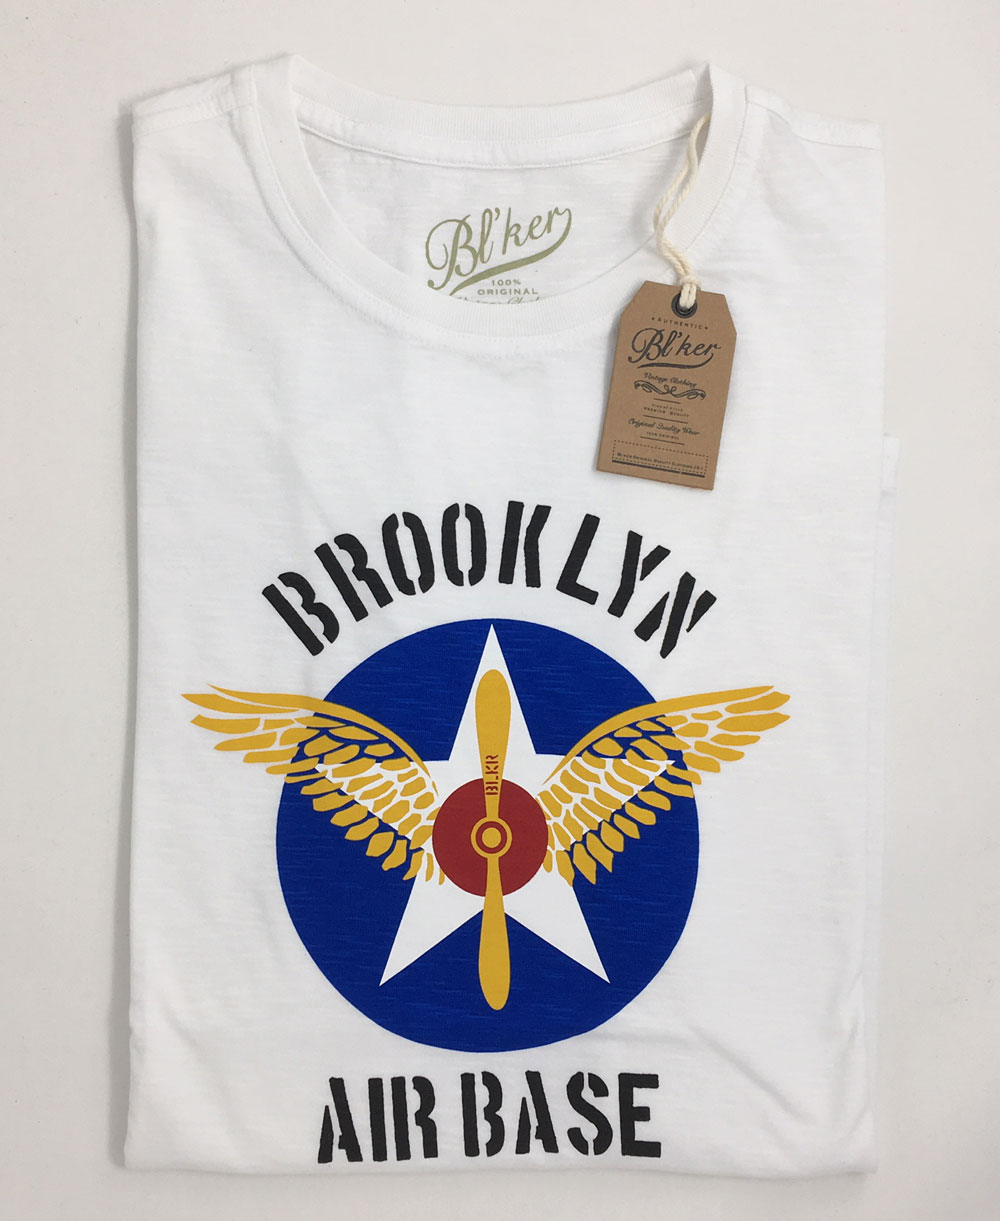 BRKL Air Base T-Shirt Manica Corta Uomo White